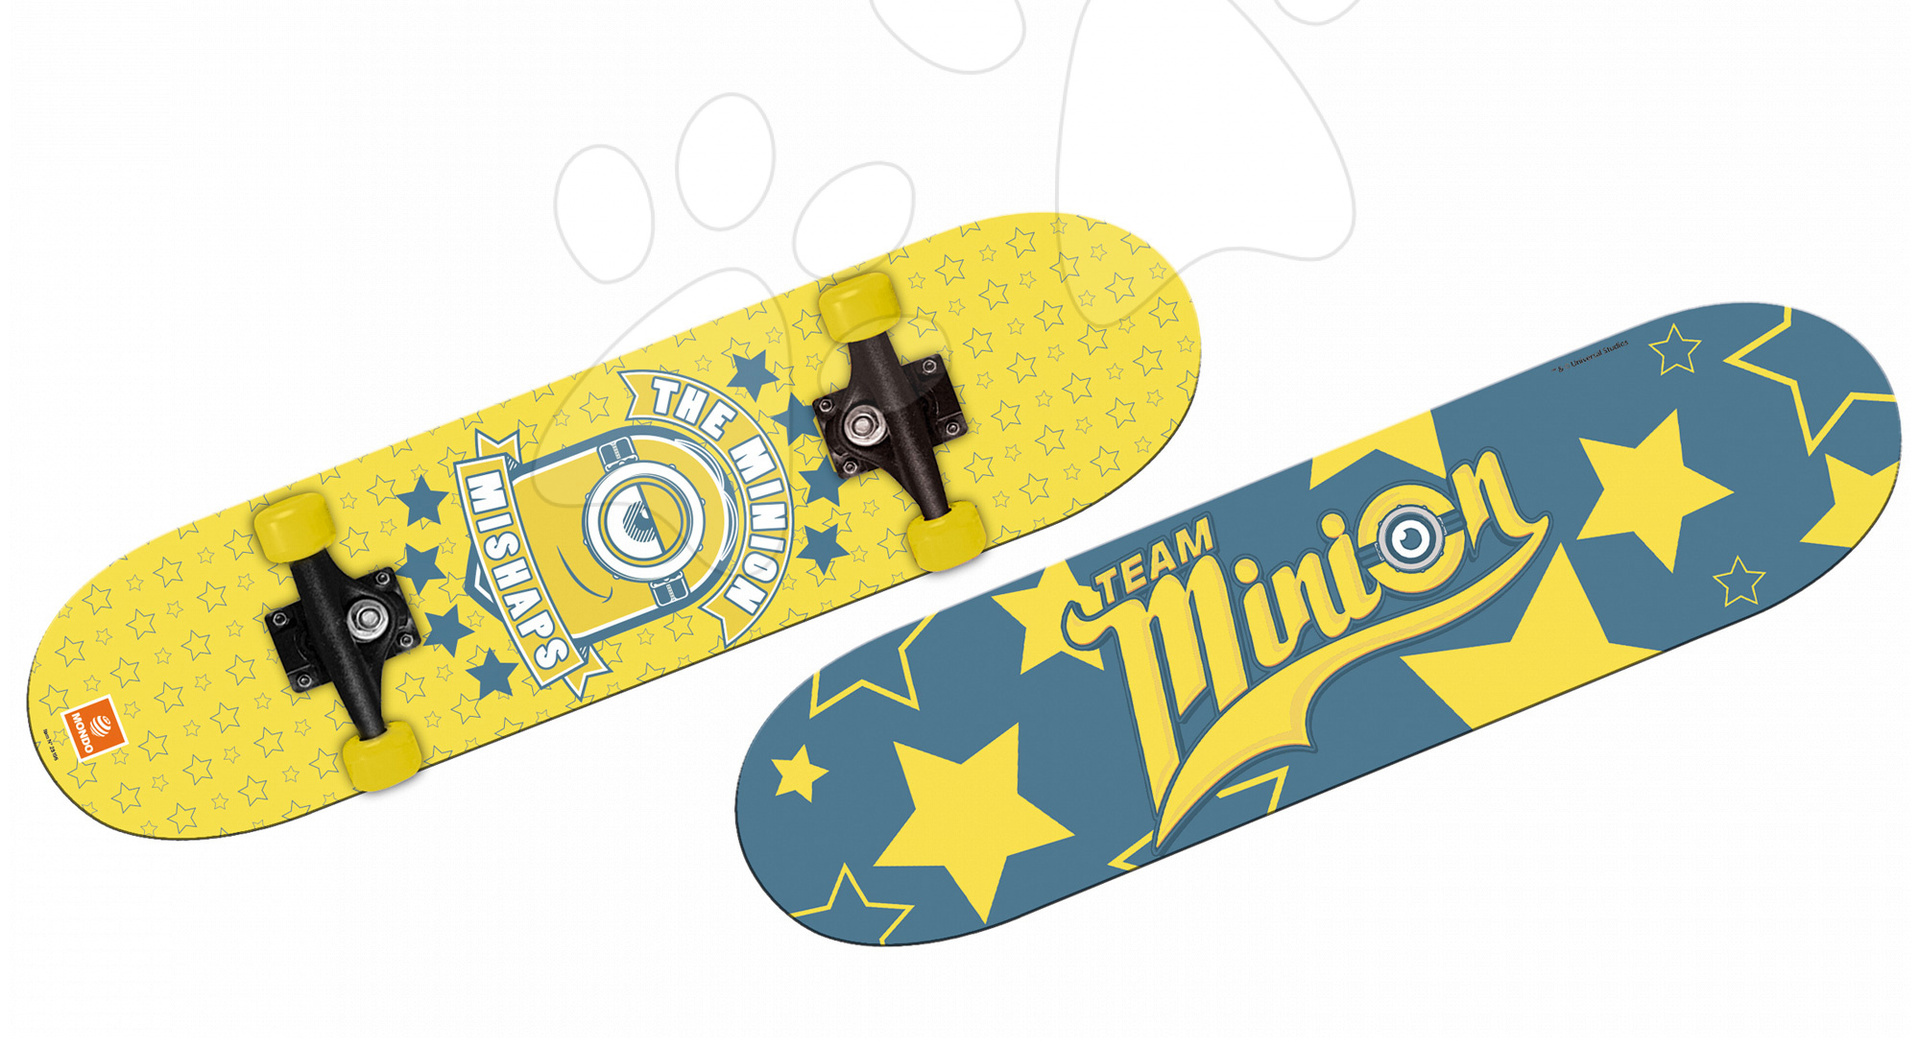 Detské skateboardy - Skateboard Mimoni Mondo dĺžka 80 cm